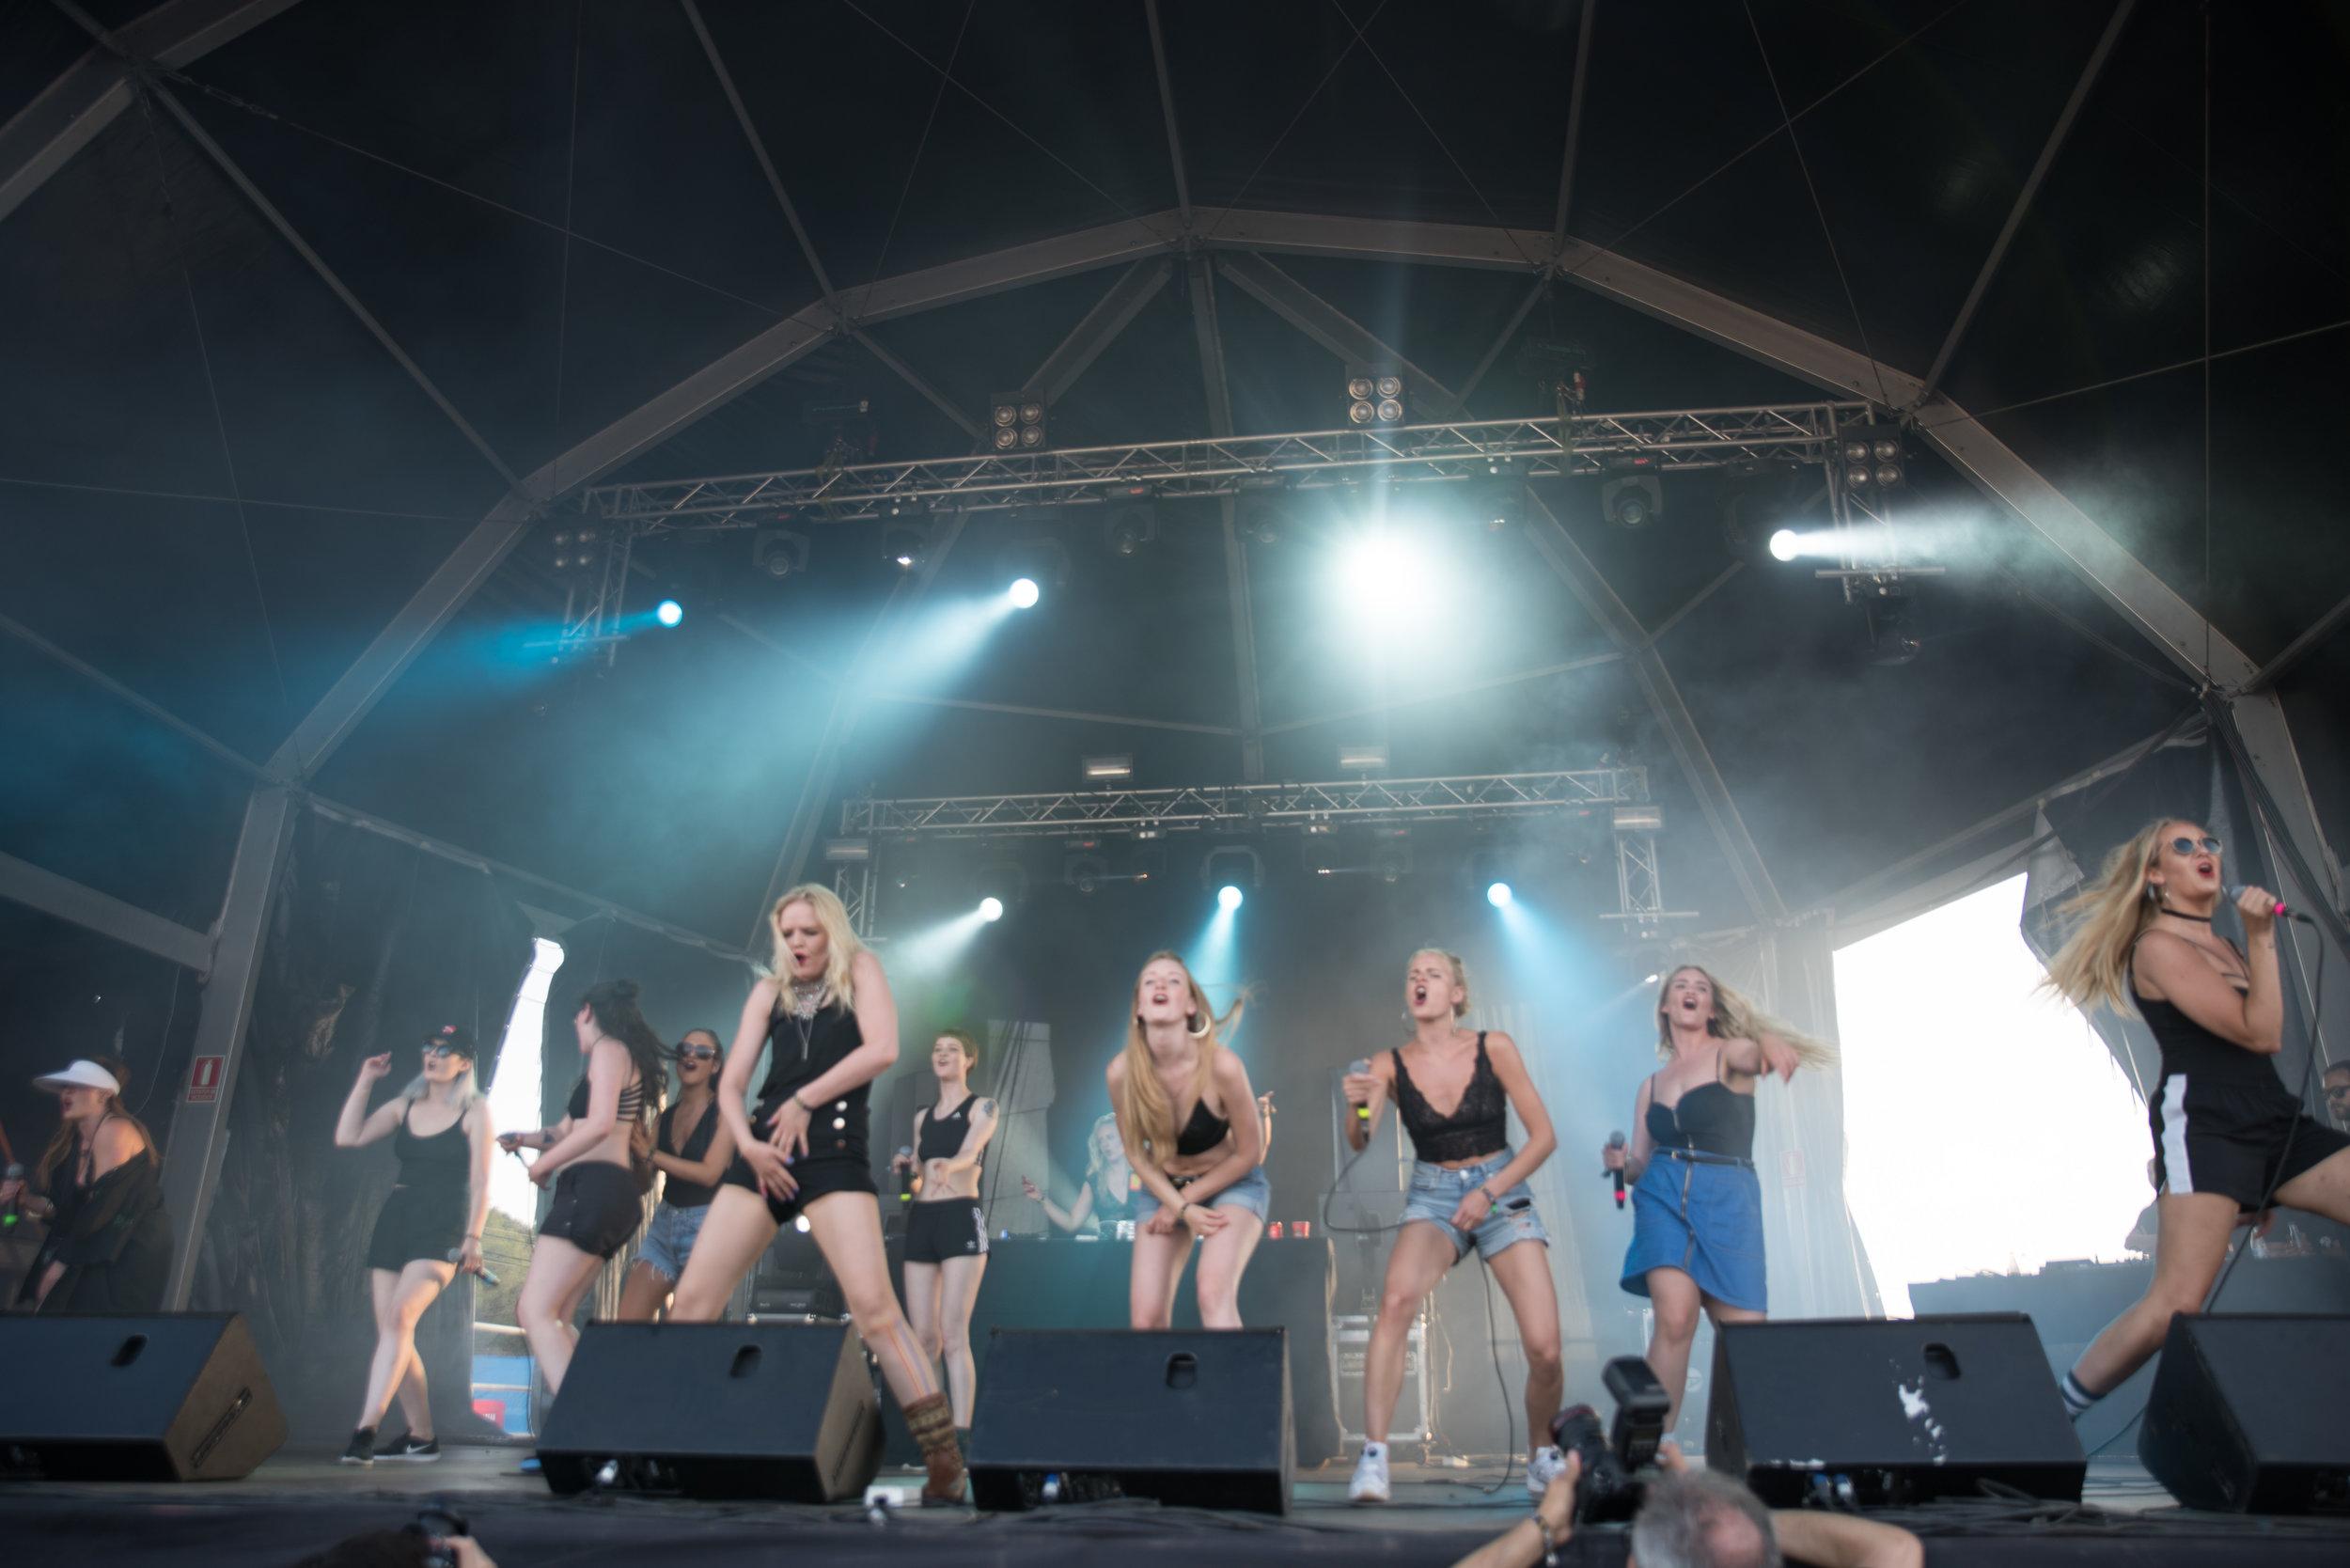 "The 16 piece feminist ""rap clan"" Reykjavíkurdætur performing at Benicàssim Festival in Spain last year. Credit: Iñaki Espejo-Saavedra (Flickr)."